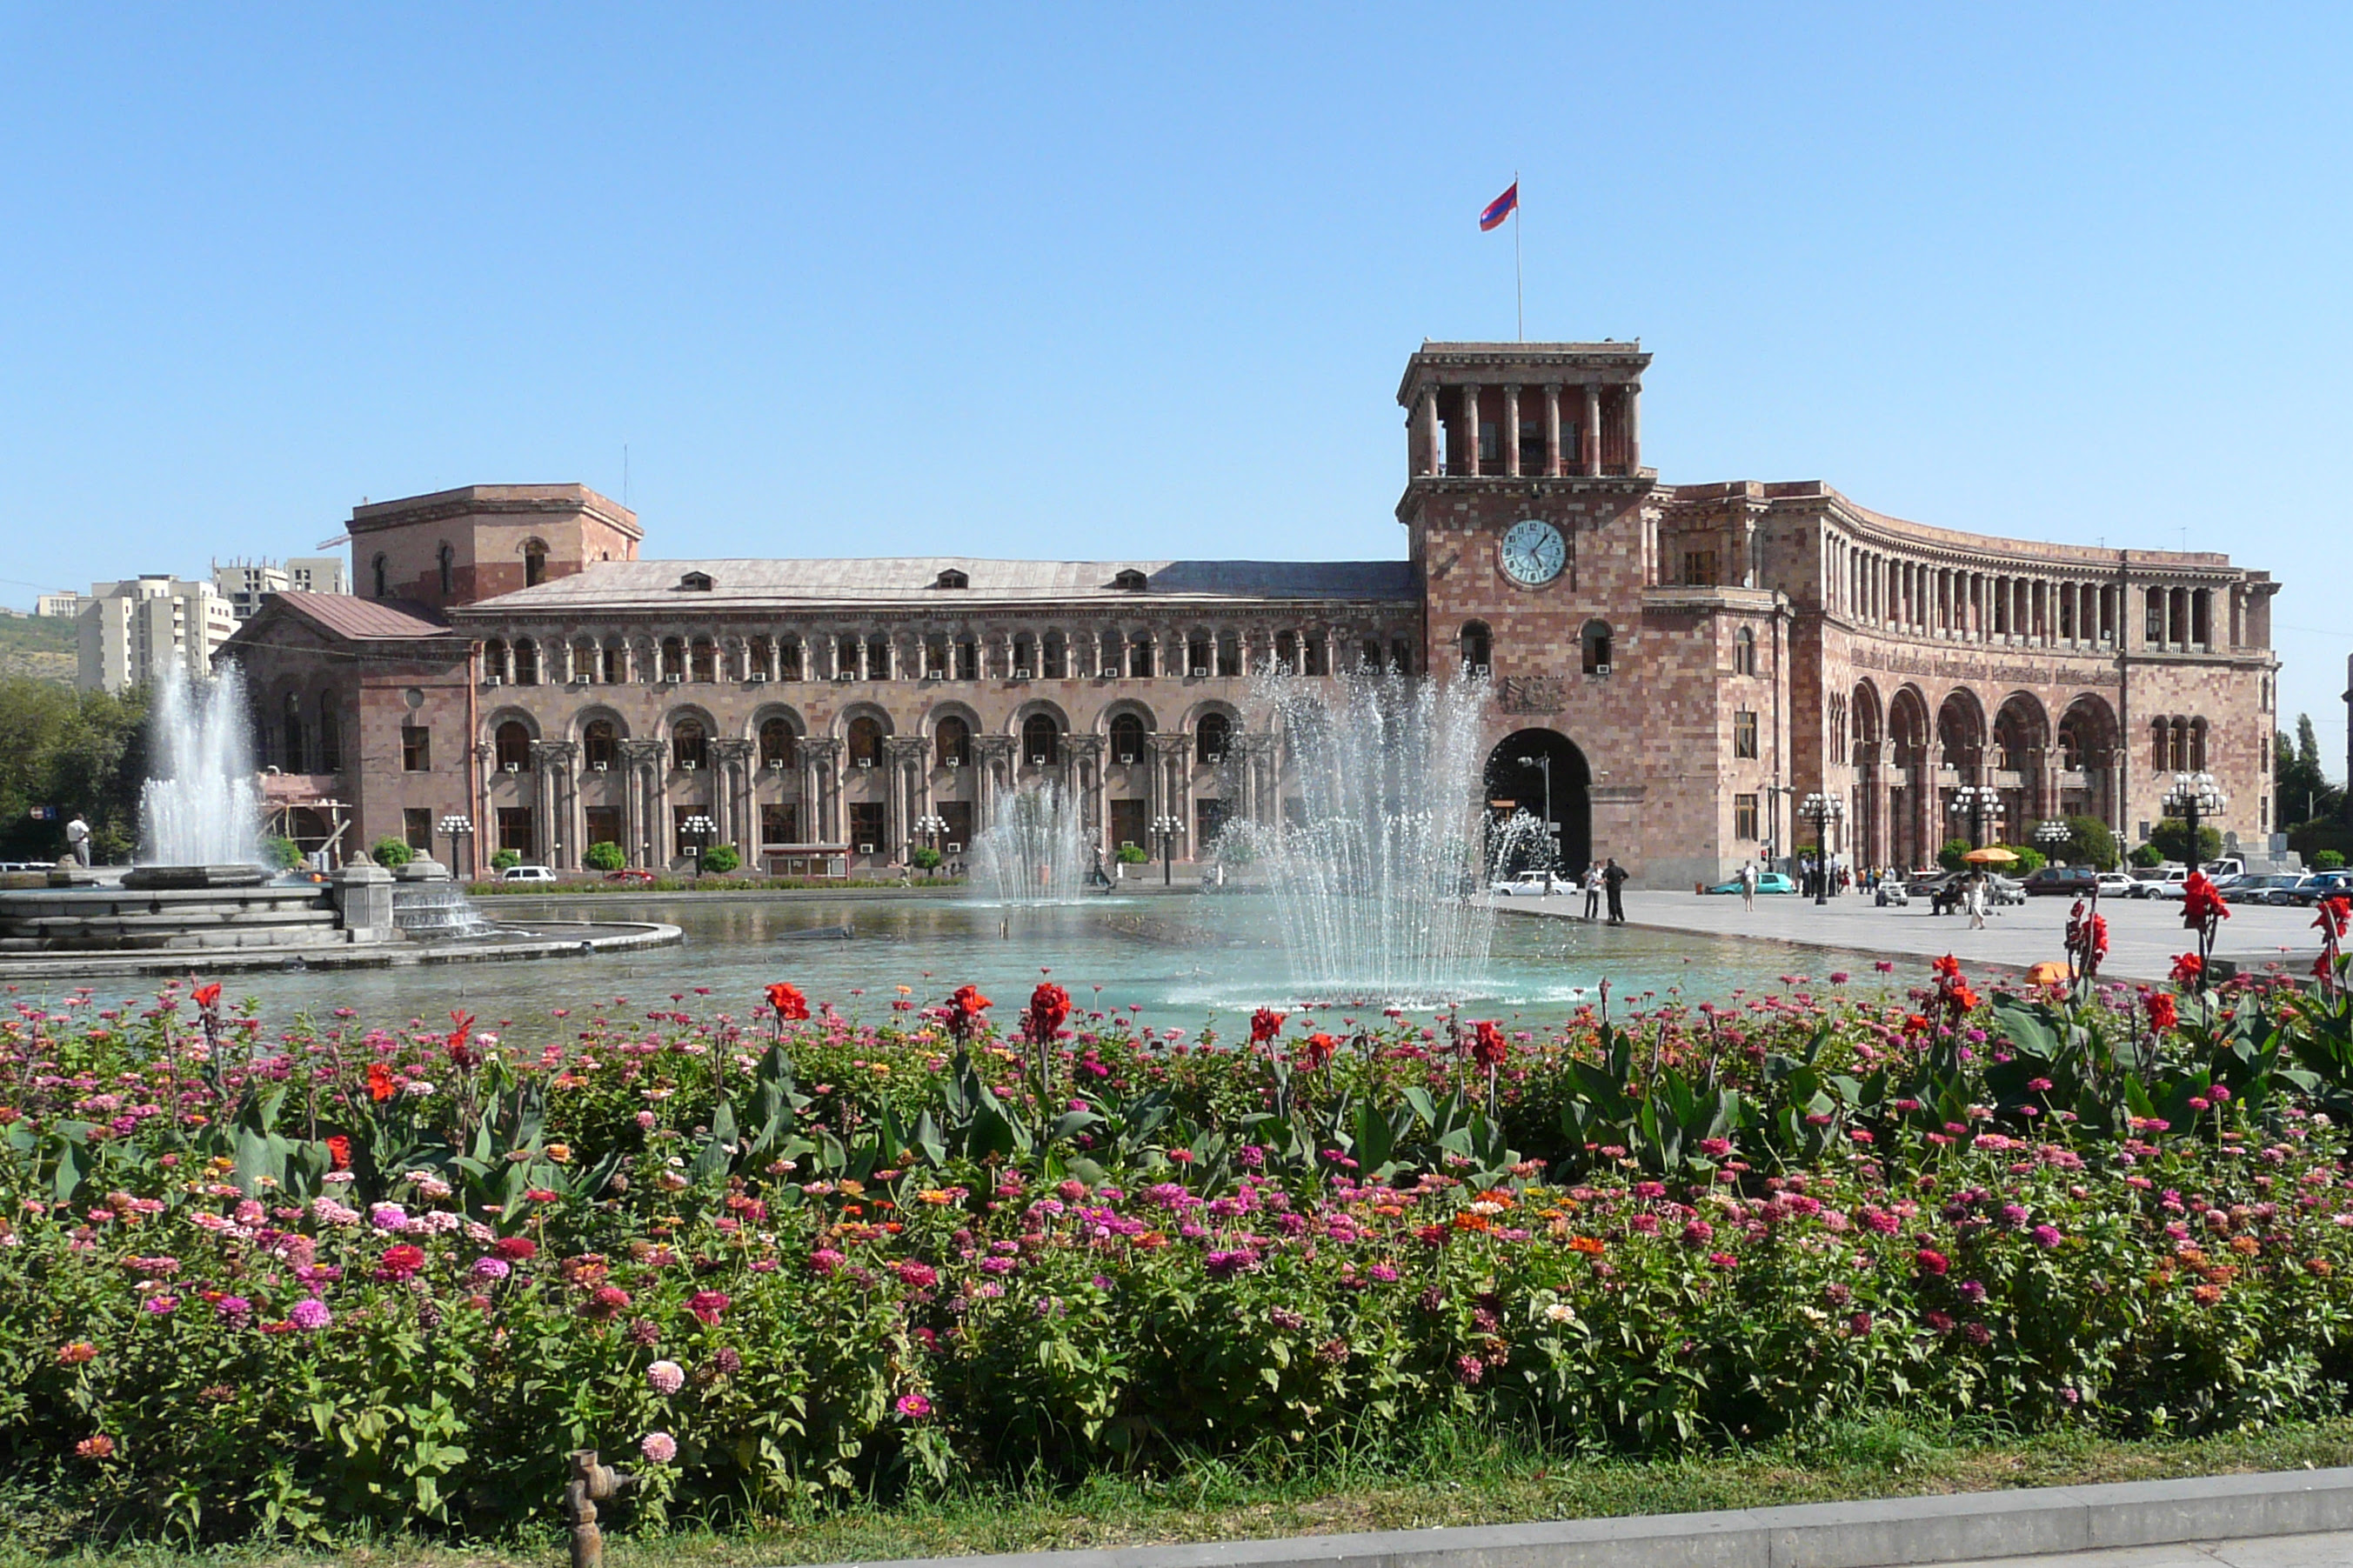 http://upload.wikimedia.org/wikipedia/commons/5/58/Yerevan_square_by_Rita_W.jpg